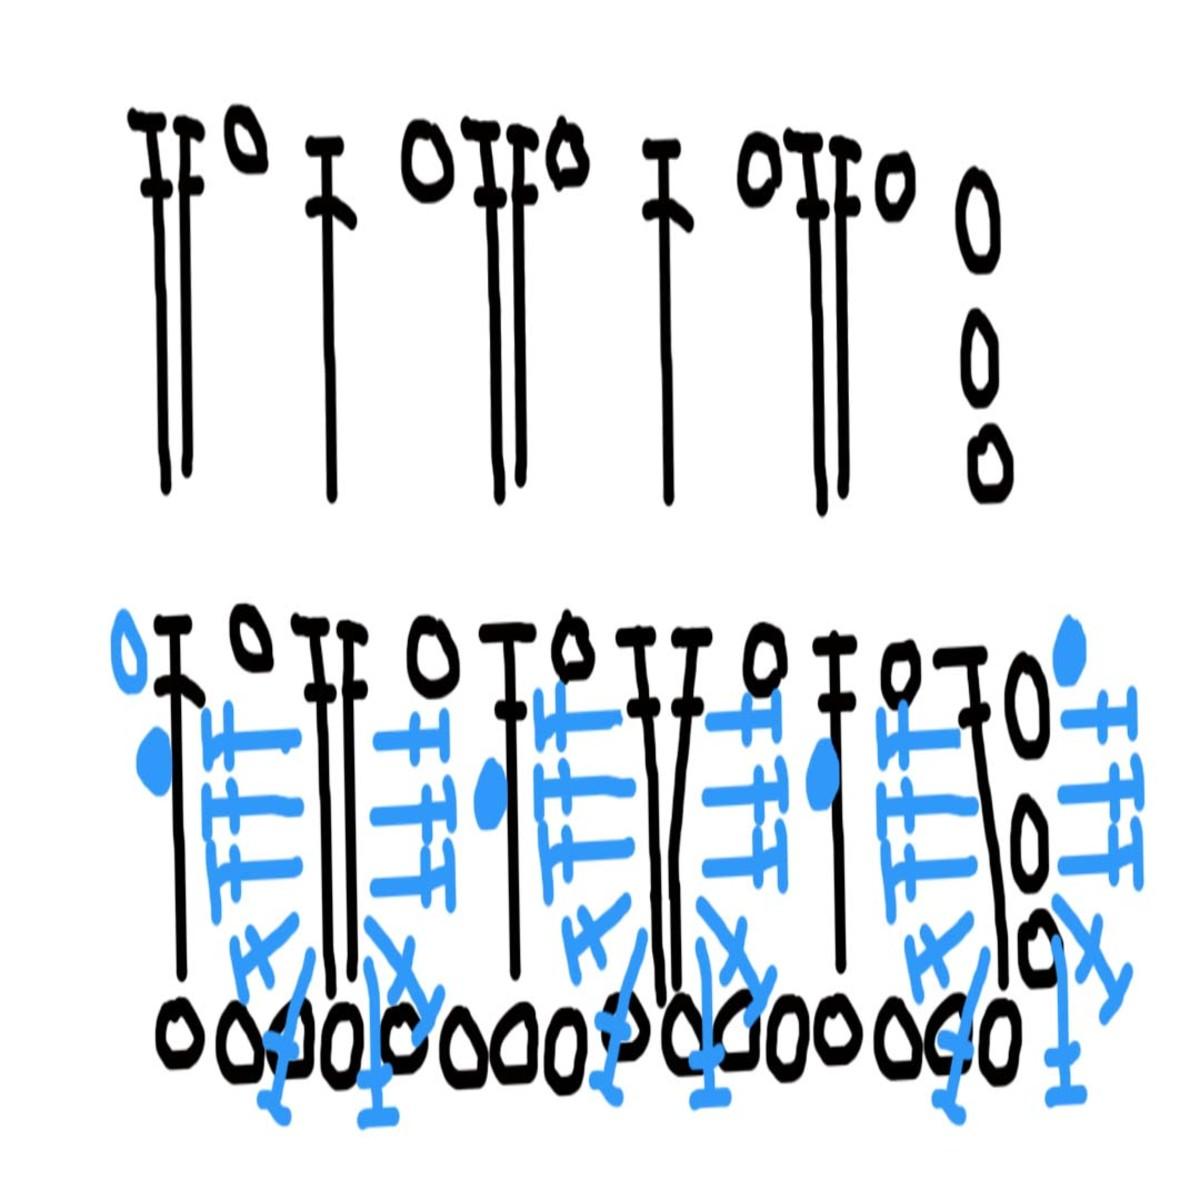 Figure 8: Row 3